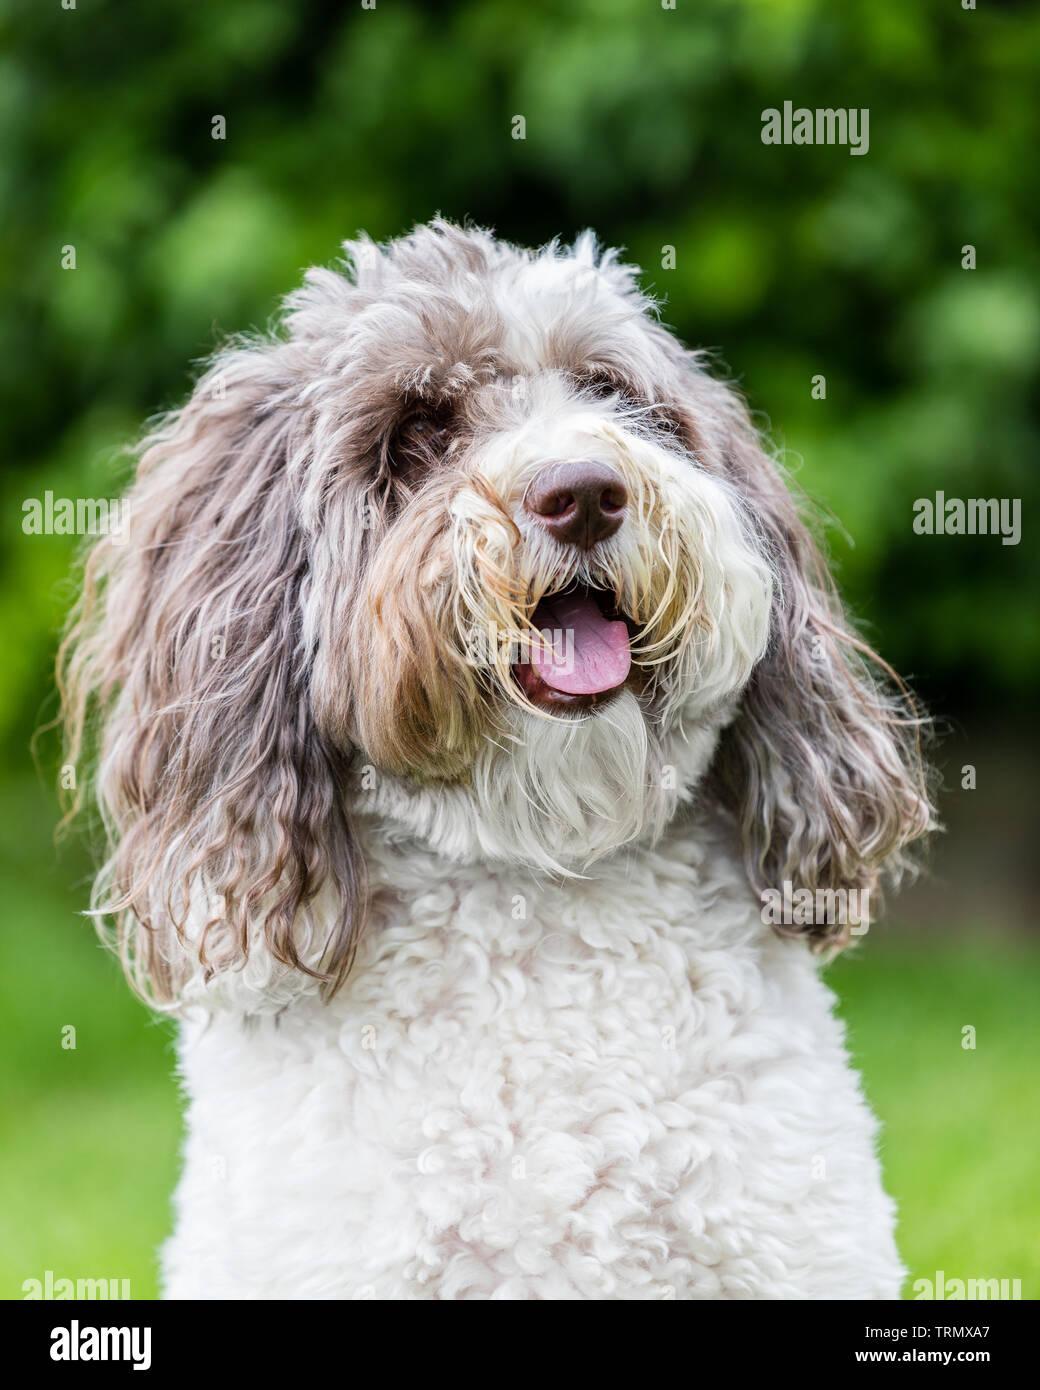 Labradoodle Puppy Dog Stock Photos & Labradoodle Puppy Dog